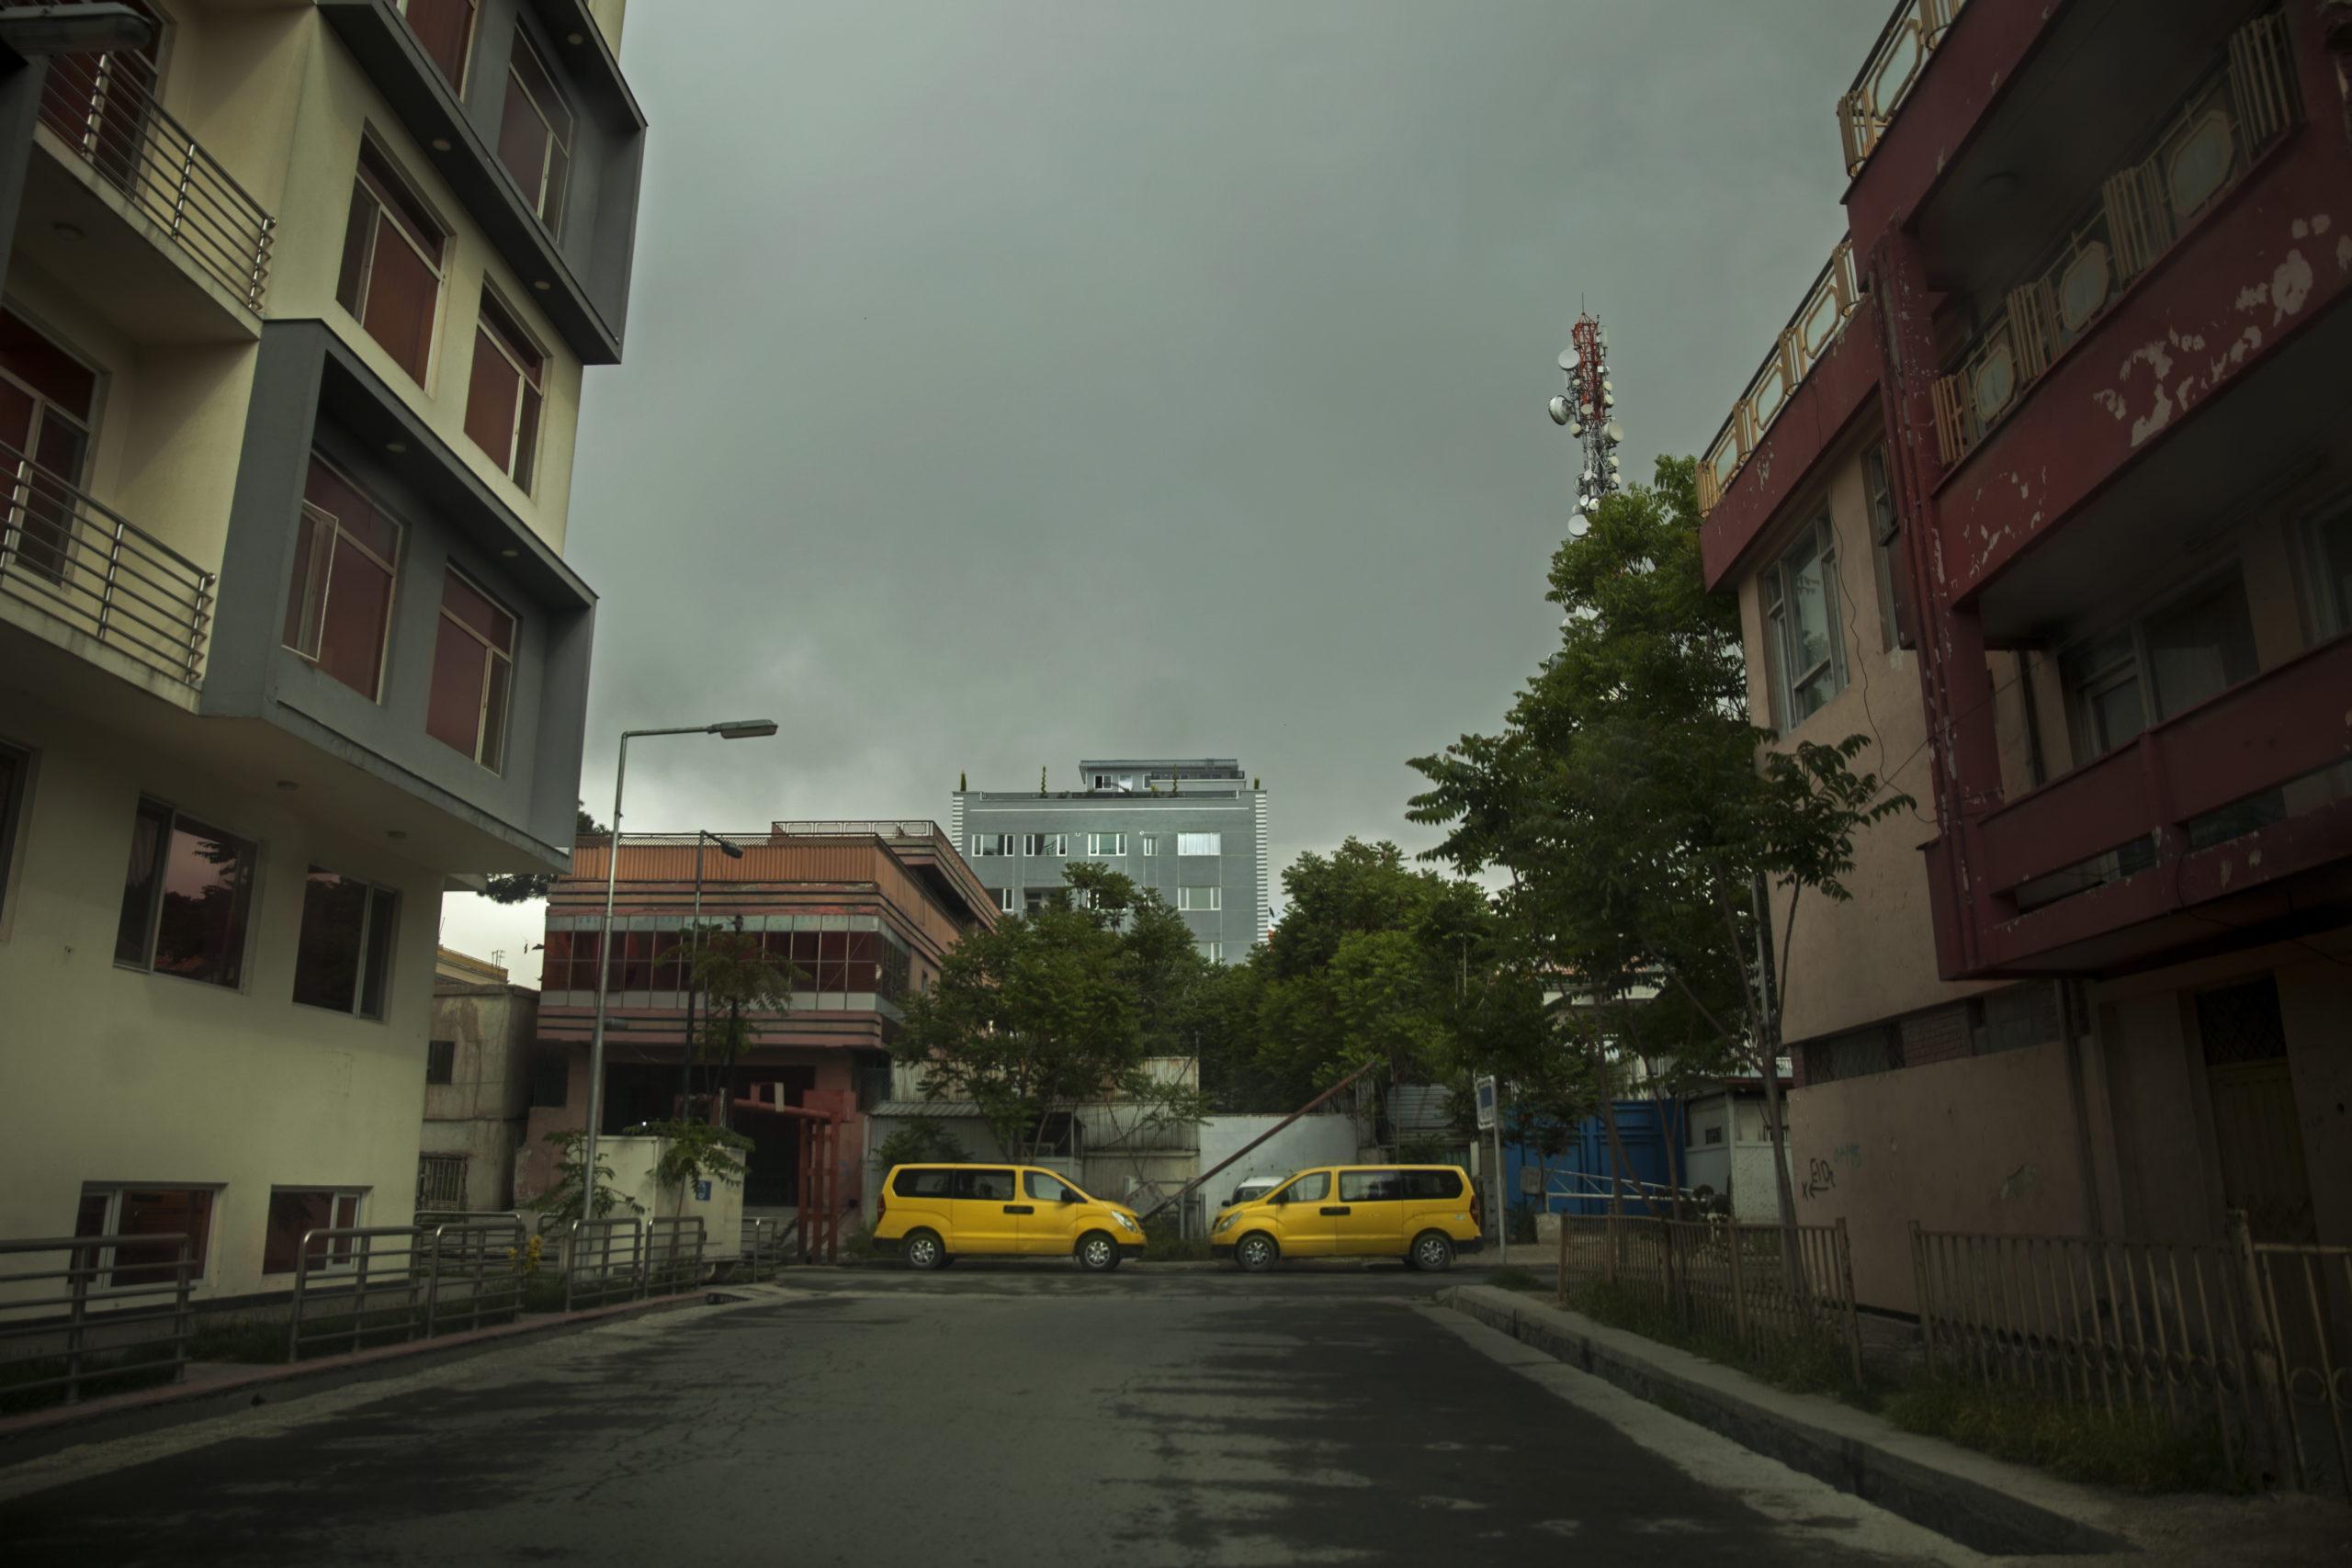 Folktom gata i Kabul under coronapandemin i Afghanistan.